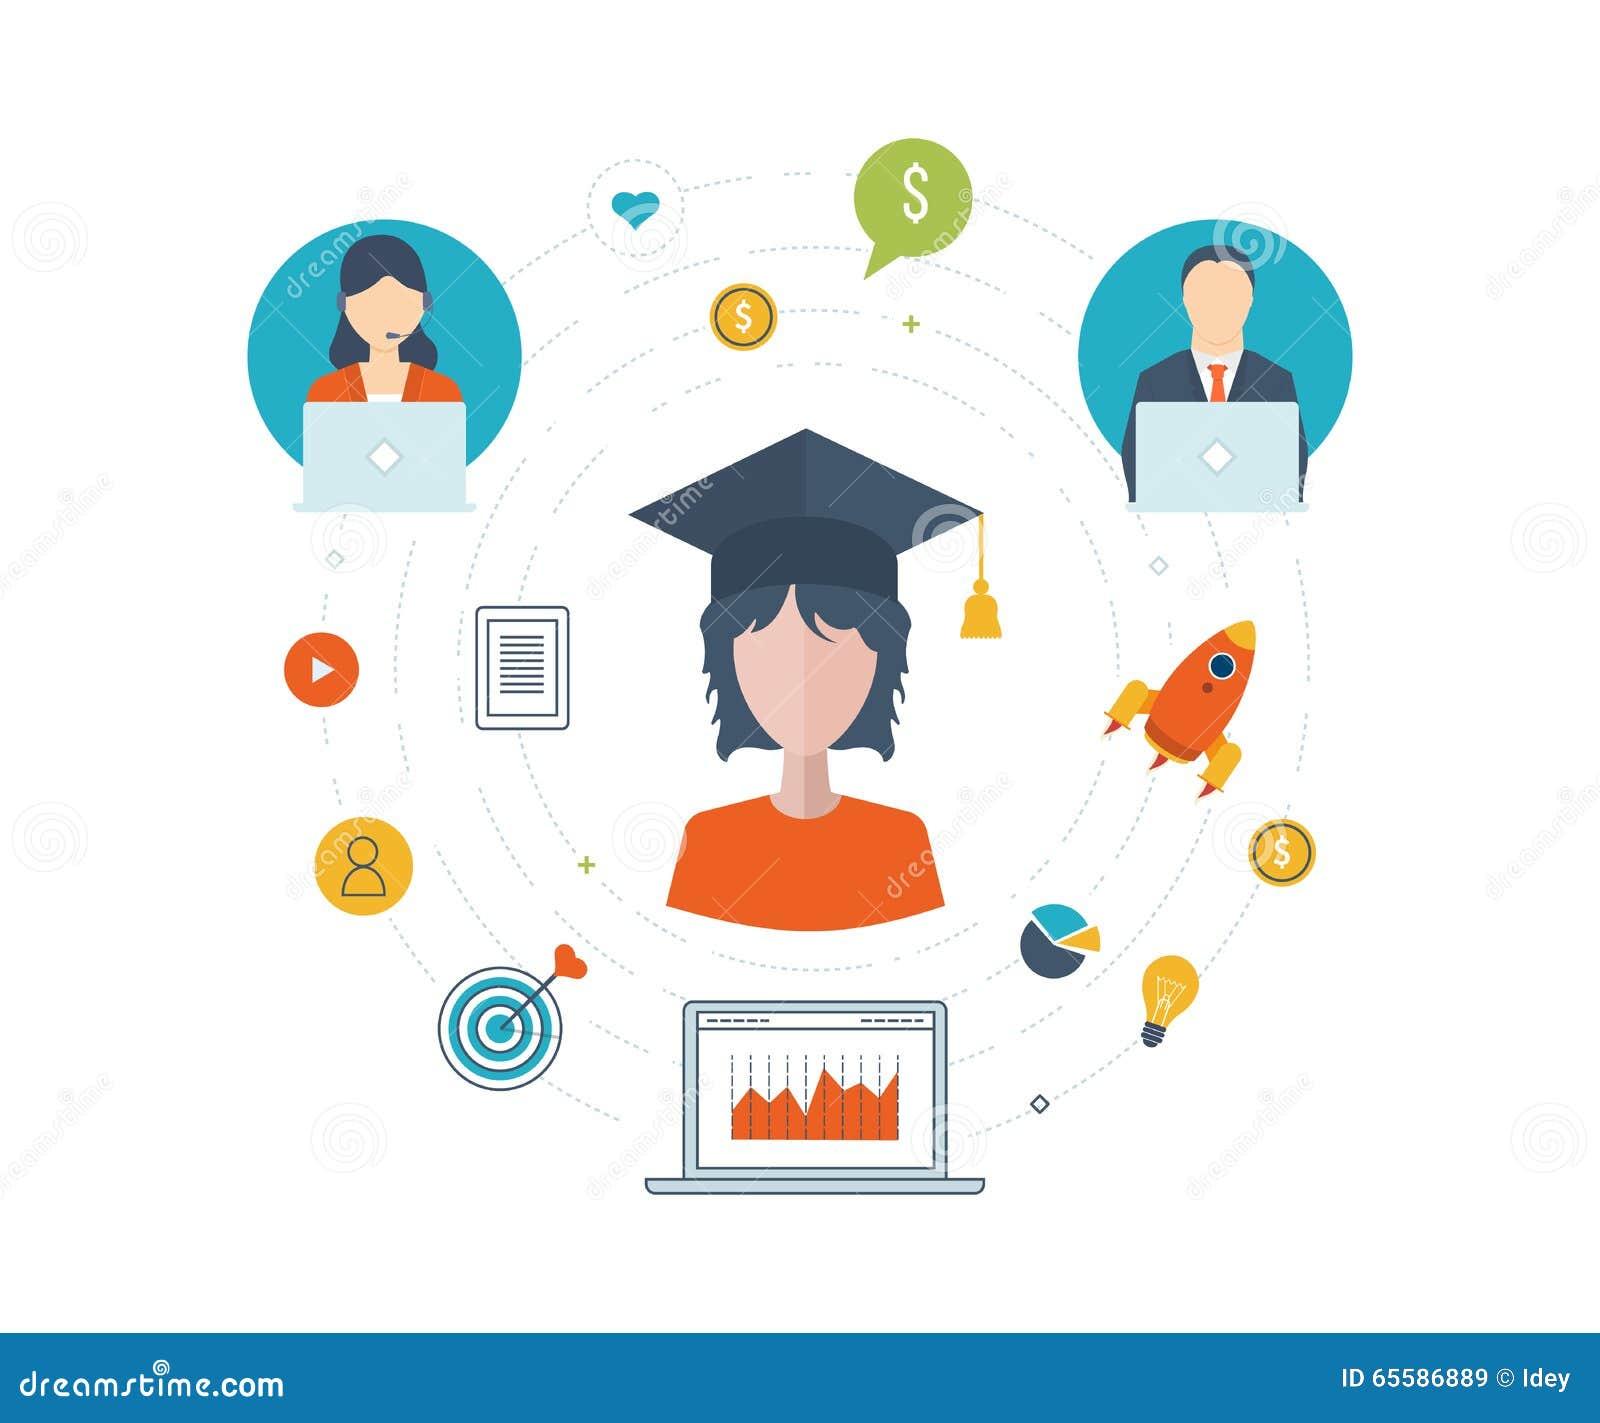 What is Strategic Marketing? - Learn.org